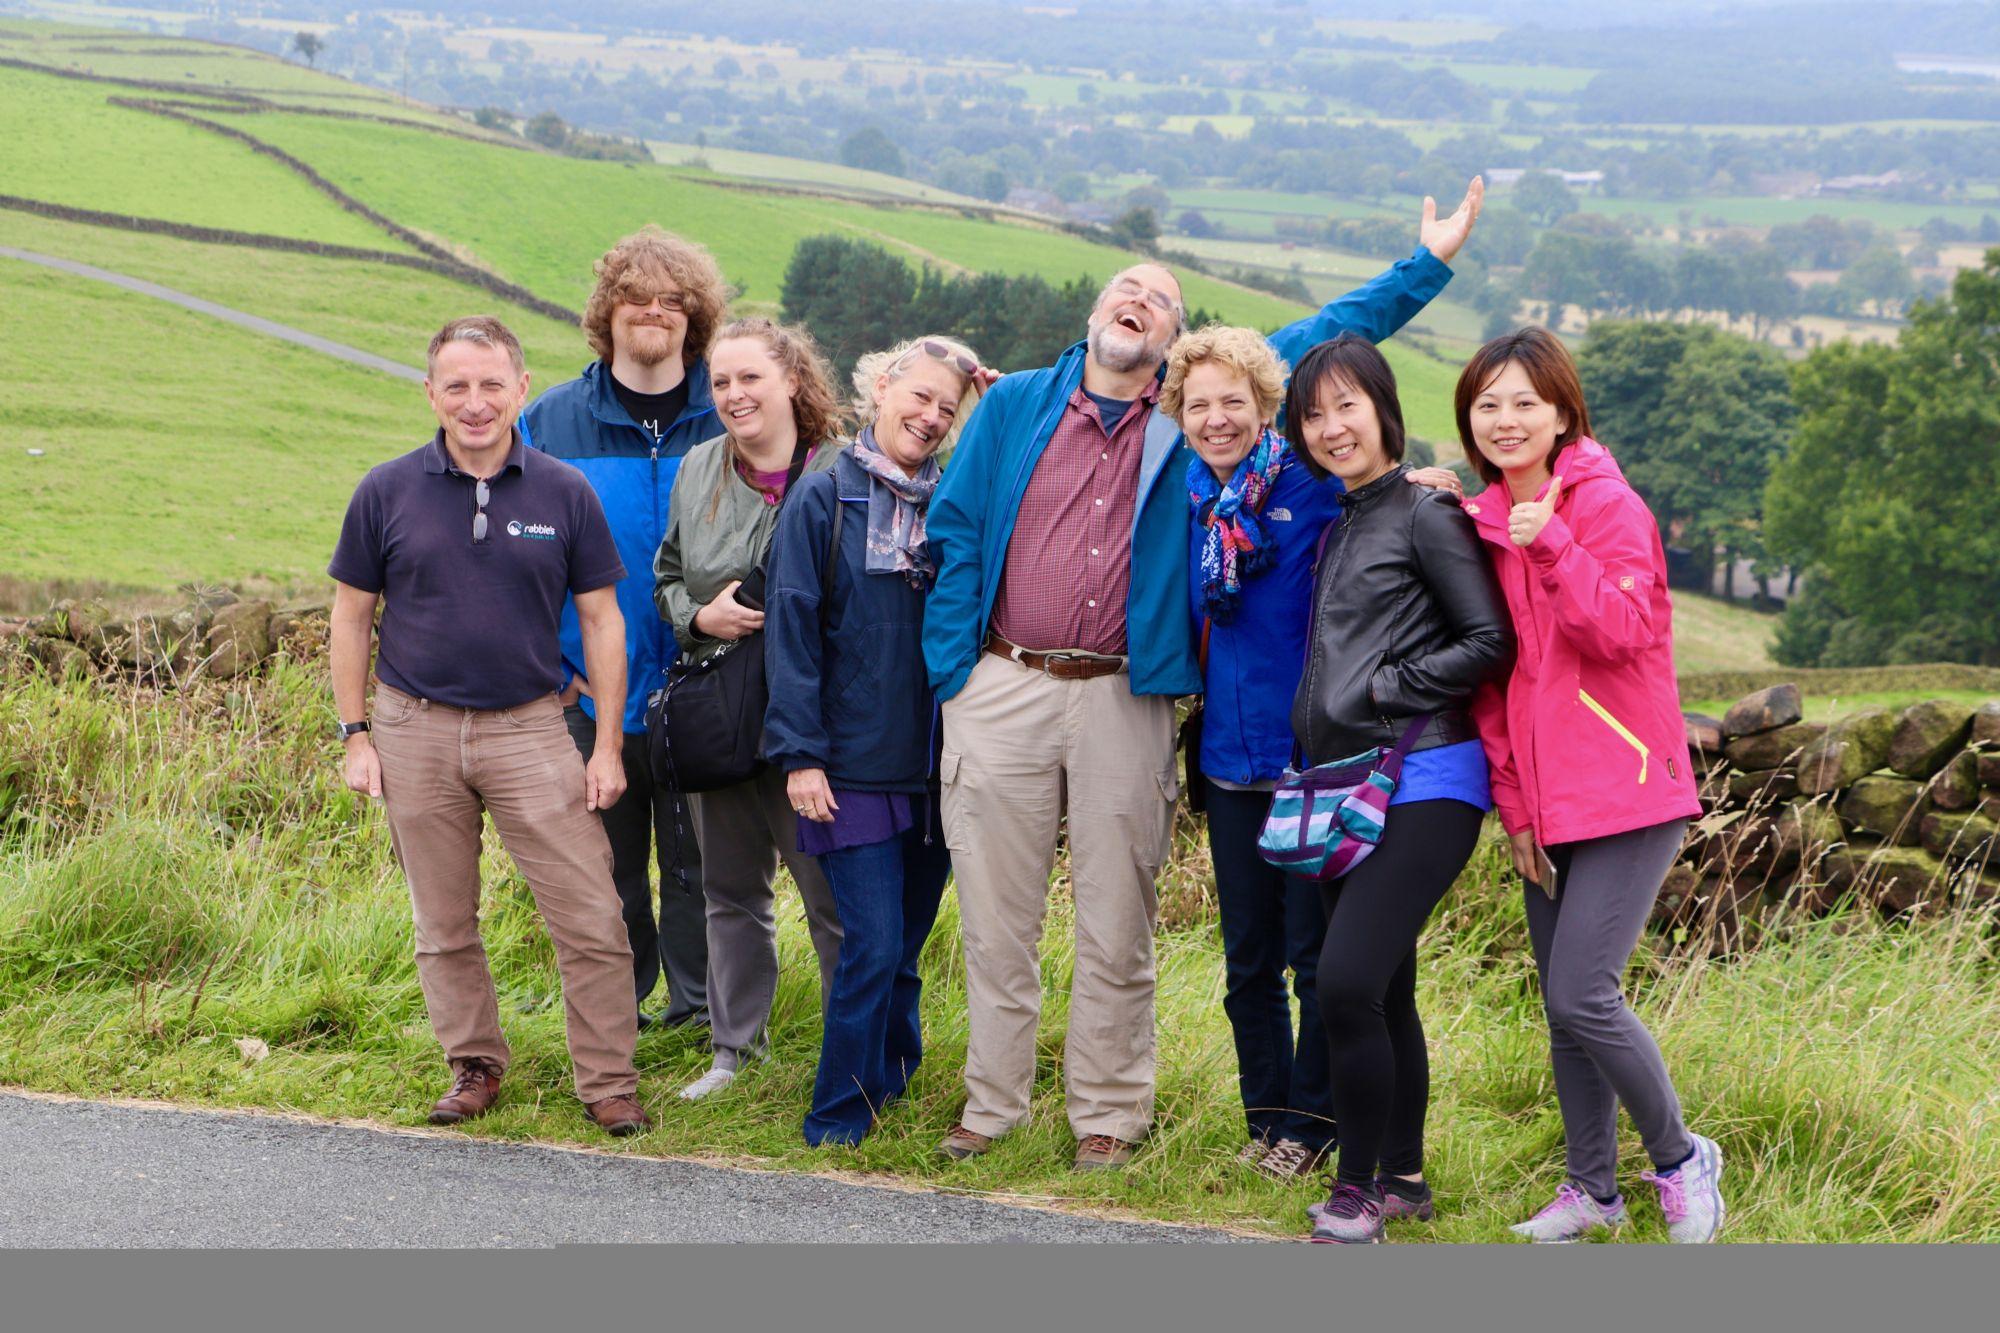 Peak District group photo